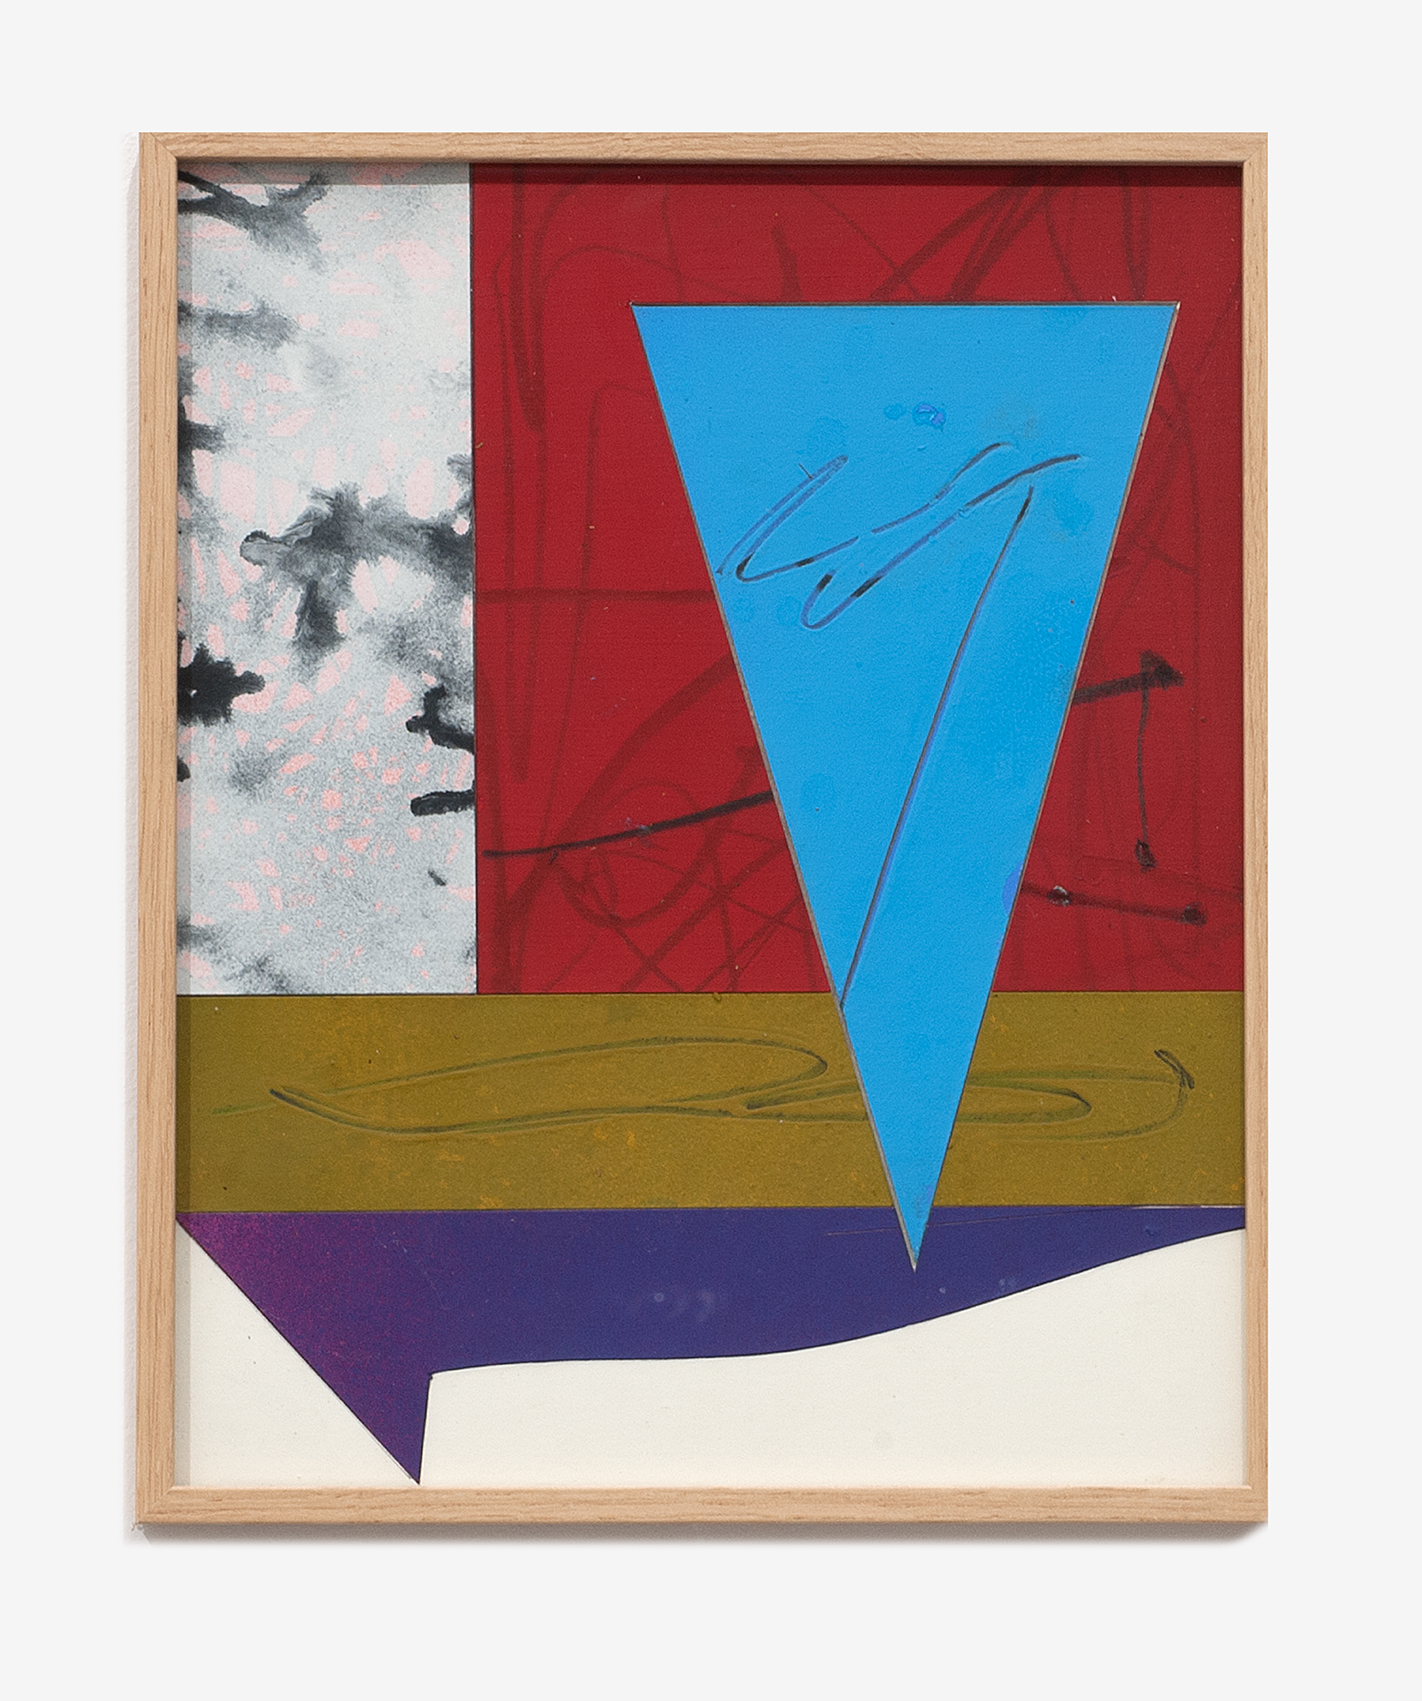 Jean-Marc Thommen, © DR / J-M Thommen, Courtesy Galerie Jean Fournier.